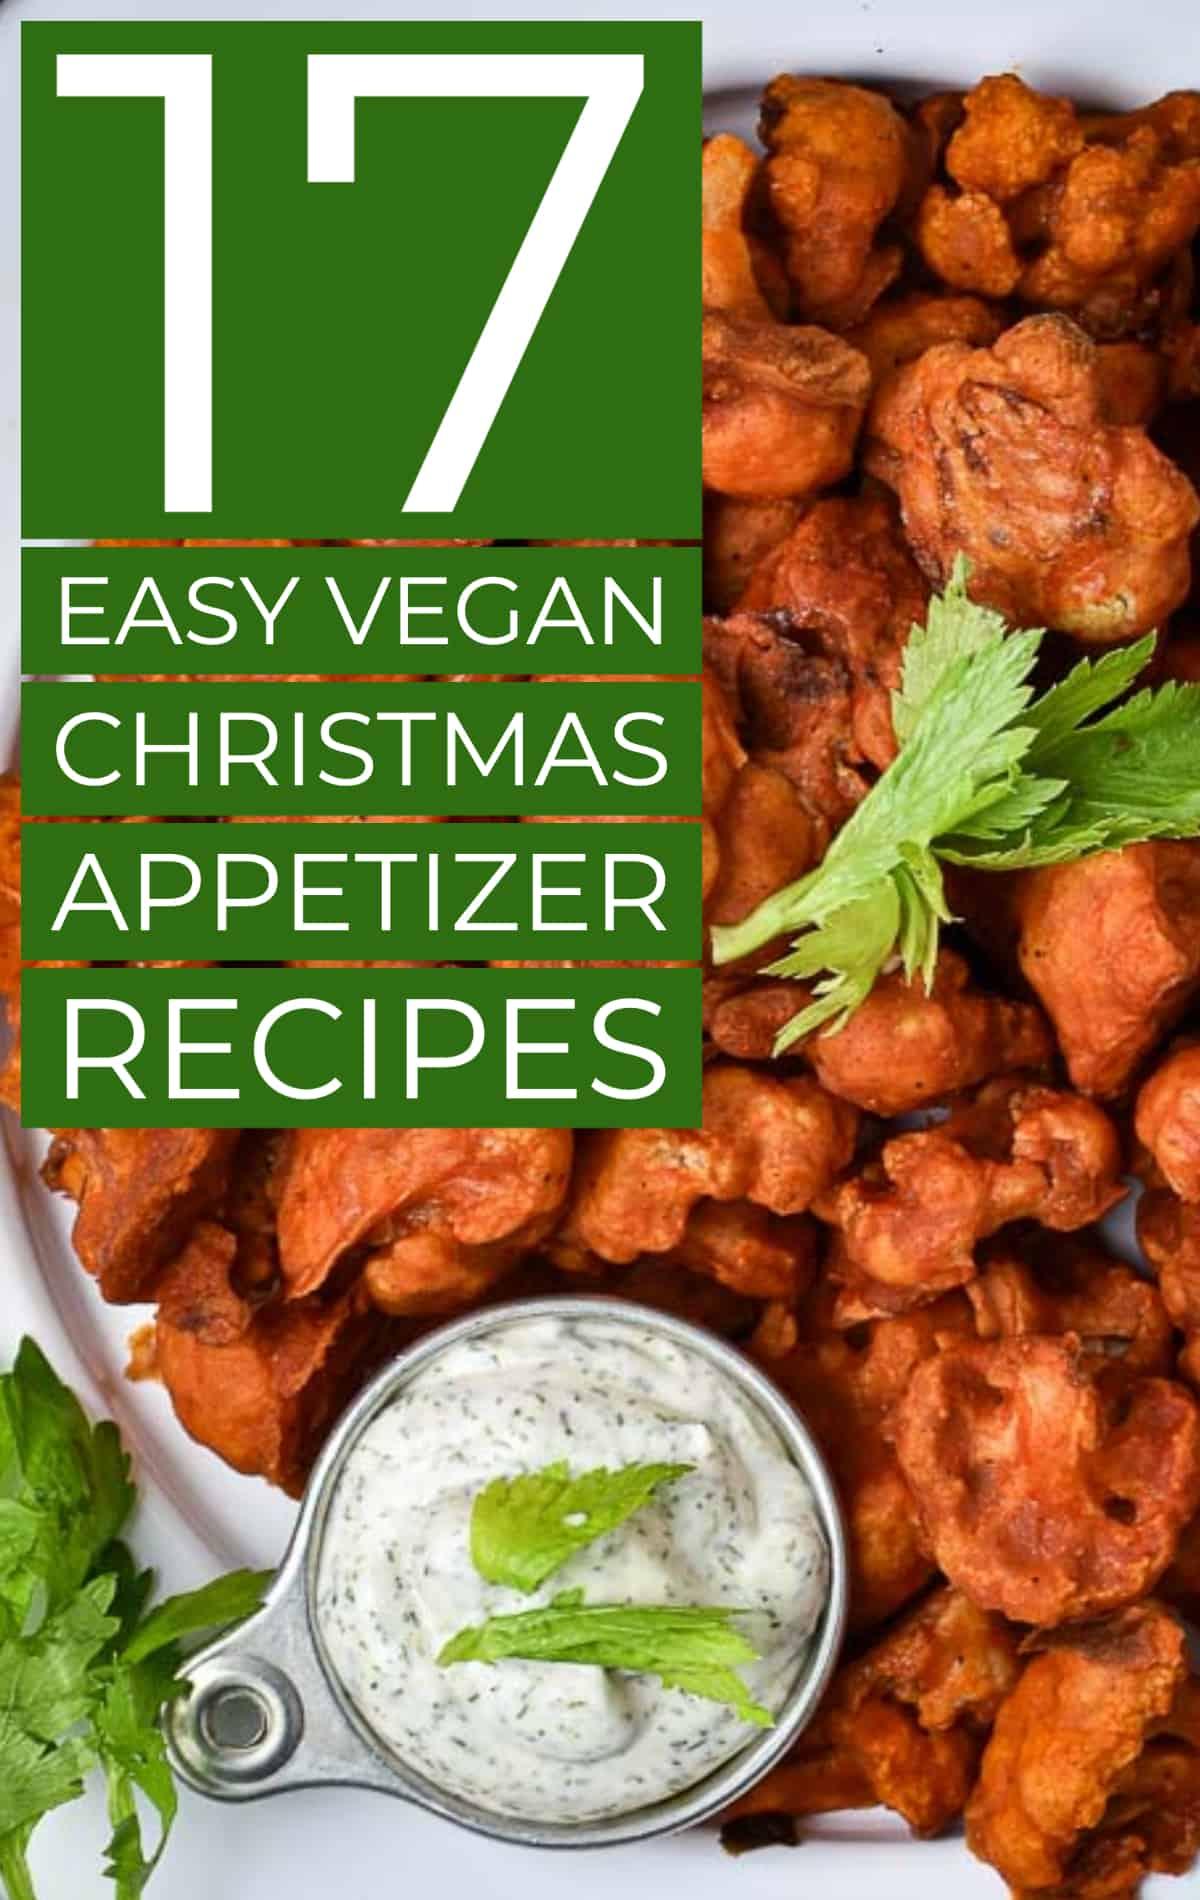 17 easy vegan Christmas appetizer recipes.